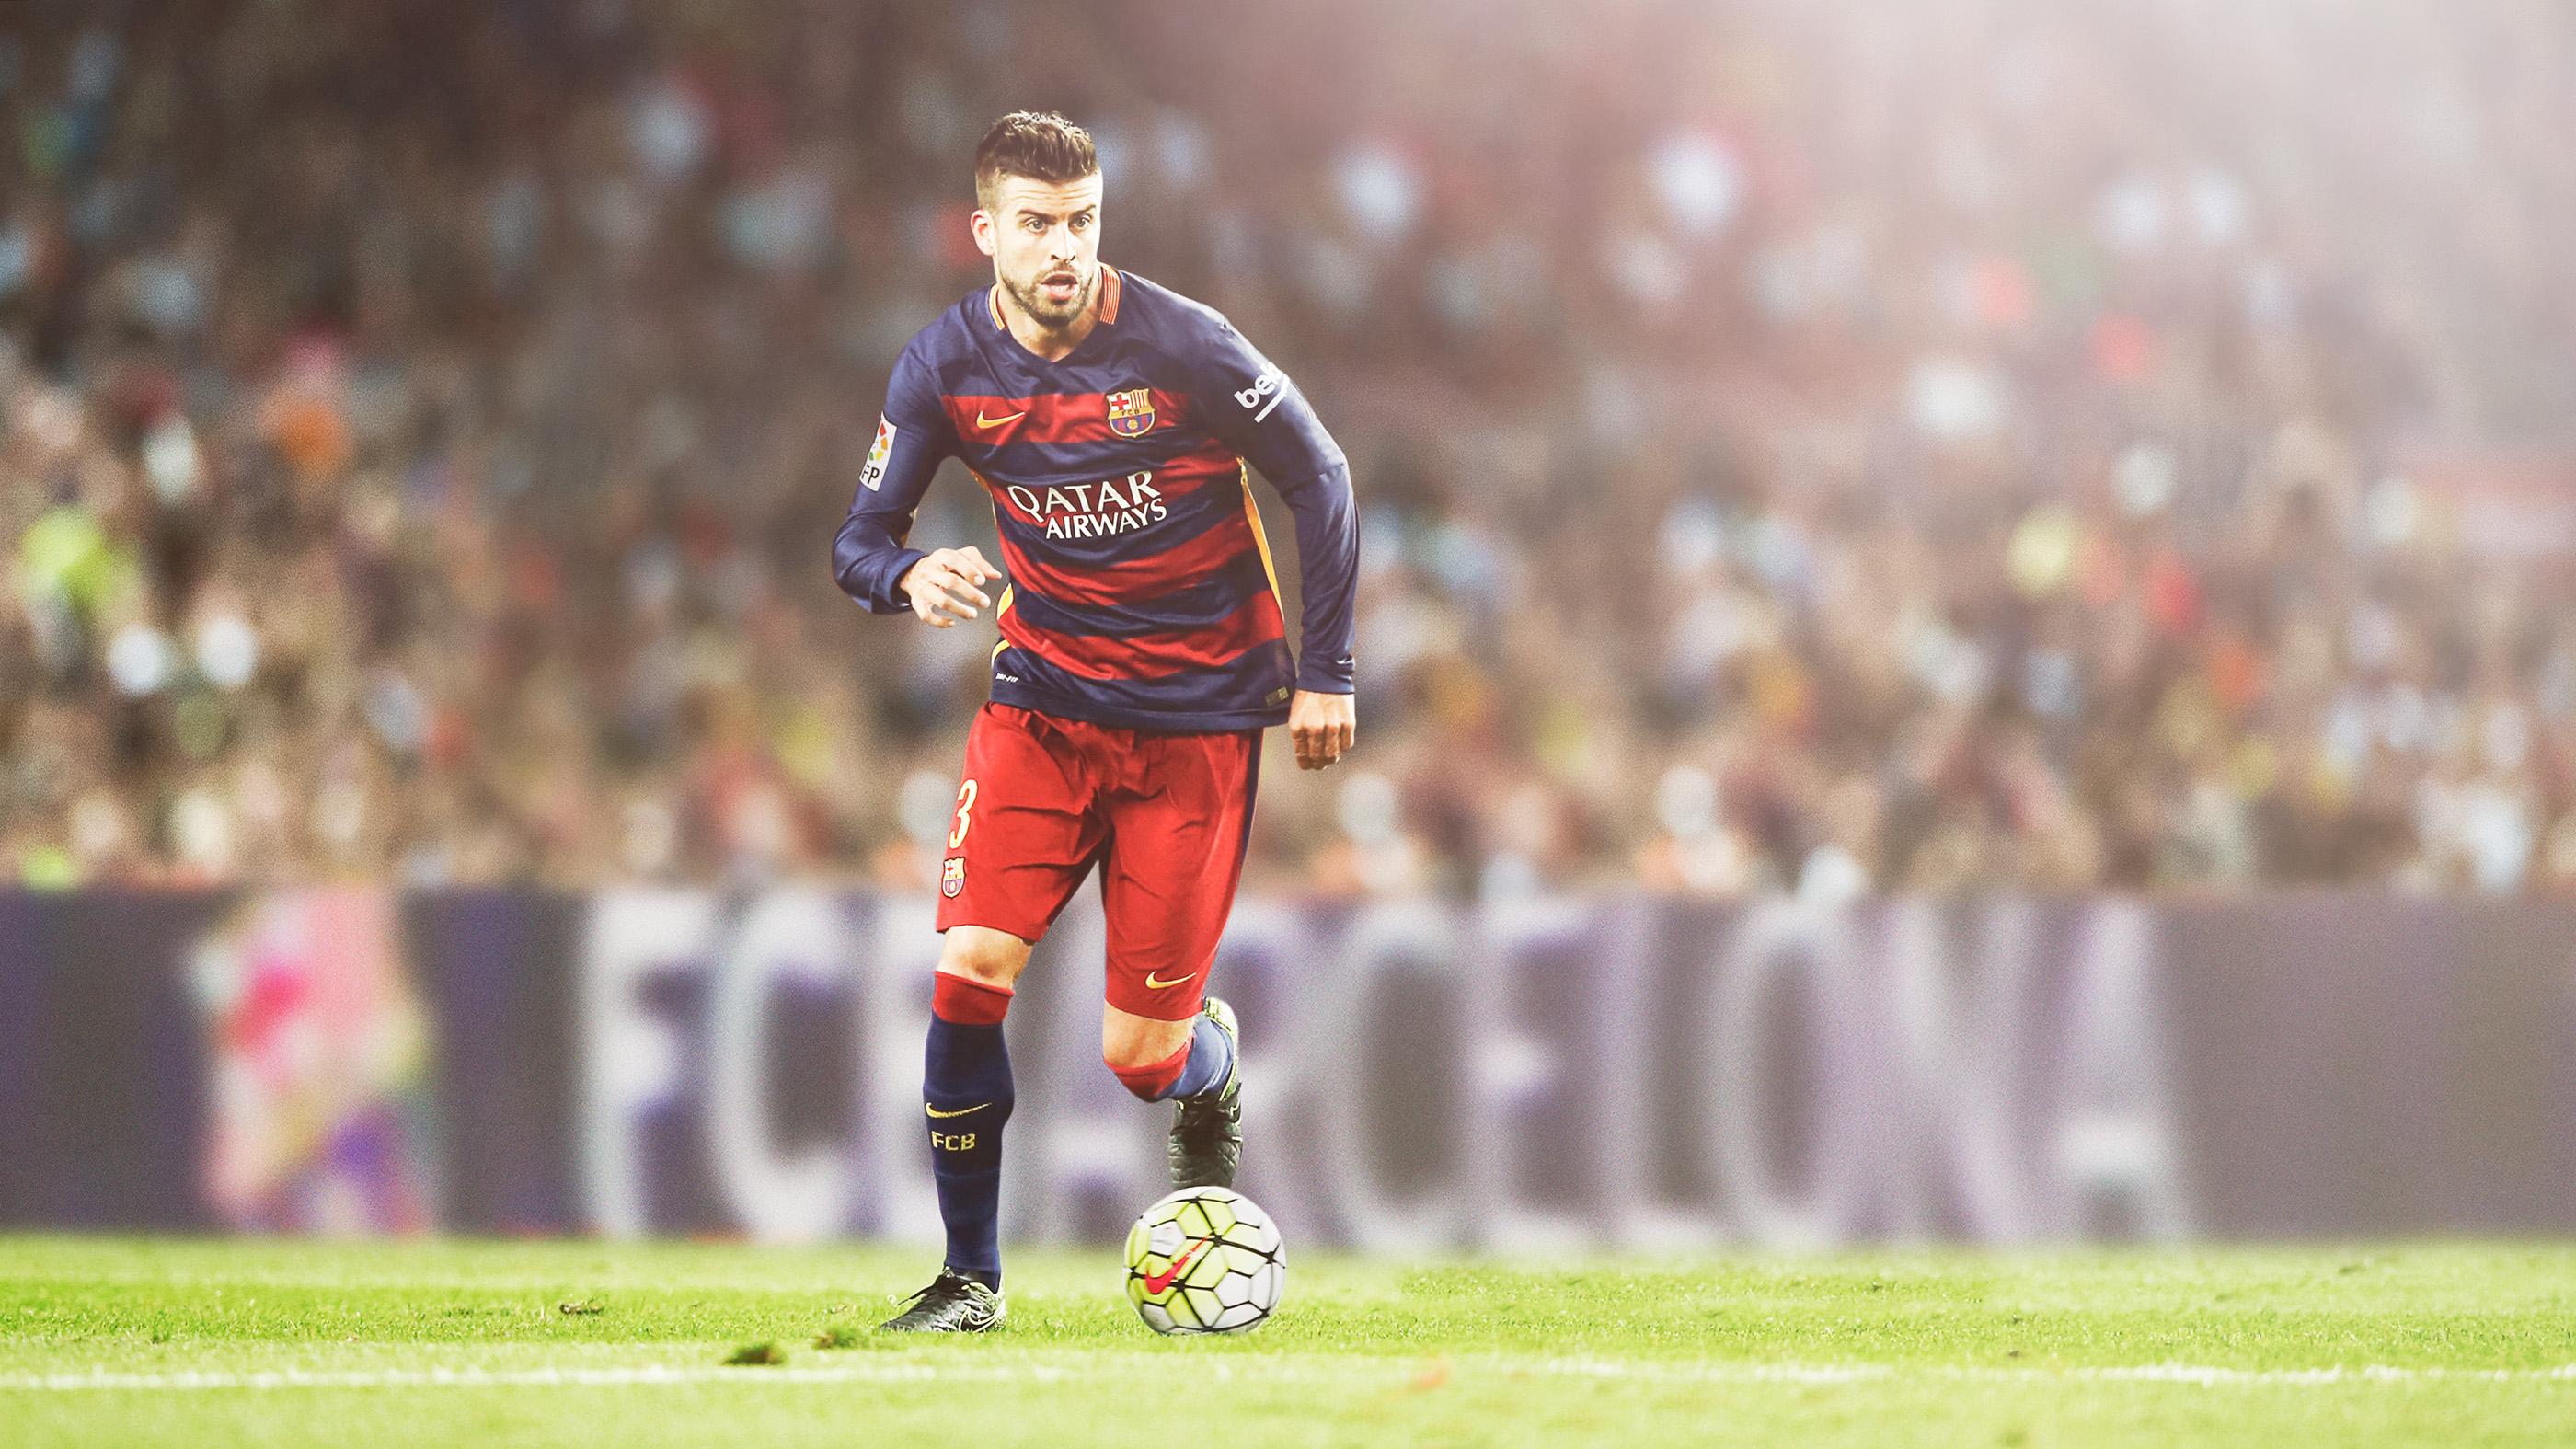 Жерар пике Барселона обои скачать